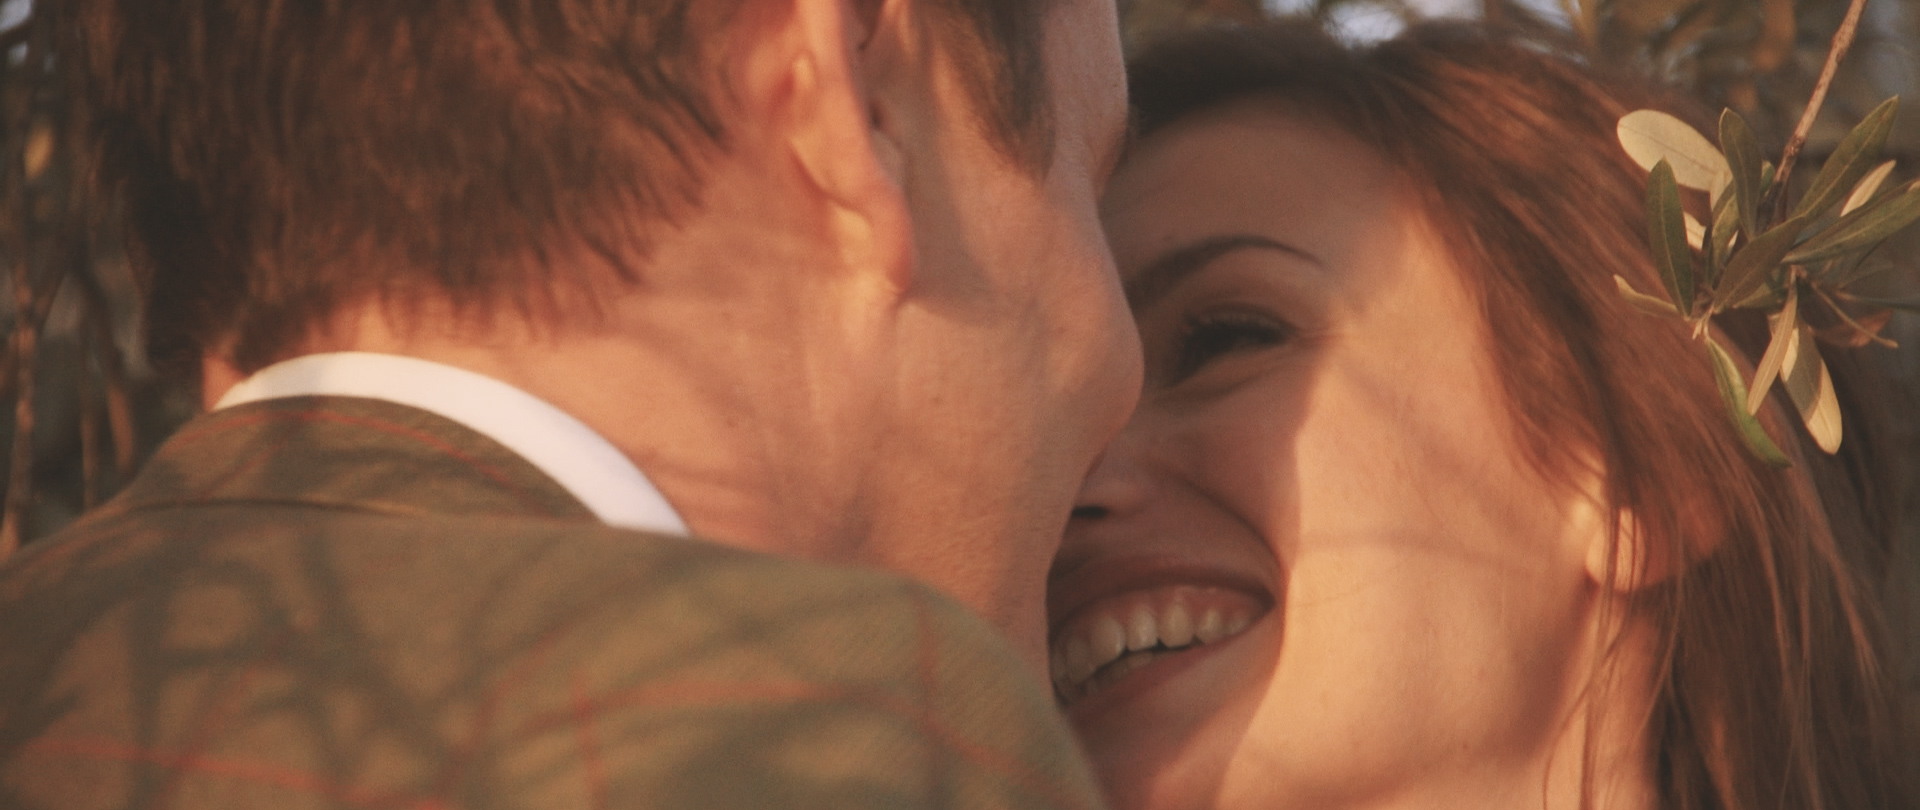 Sara e Ruary video matrimonio Lazise Dogana Veneta Lago di Garda Sara and Ruary wedding video Lazise Dogana Veneta Garda Lake